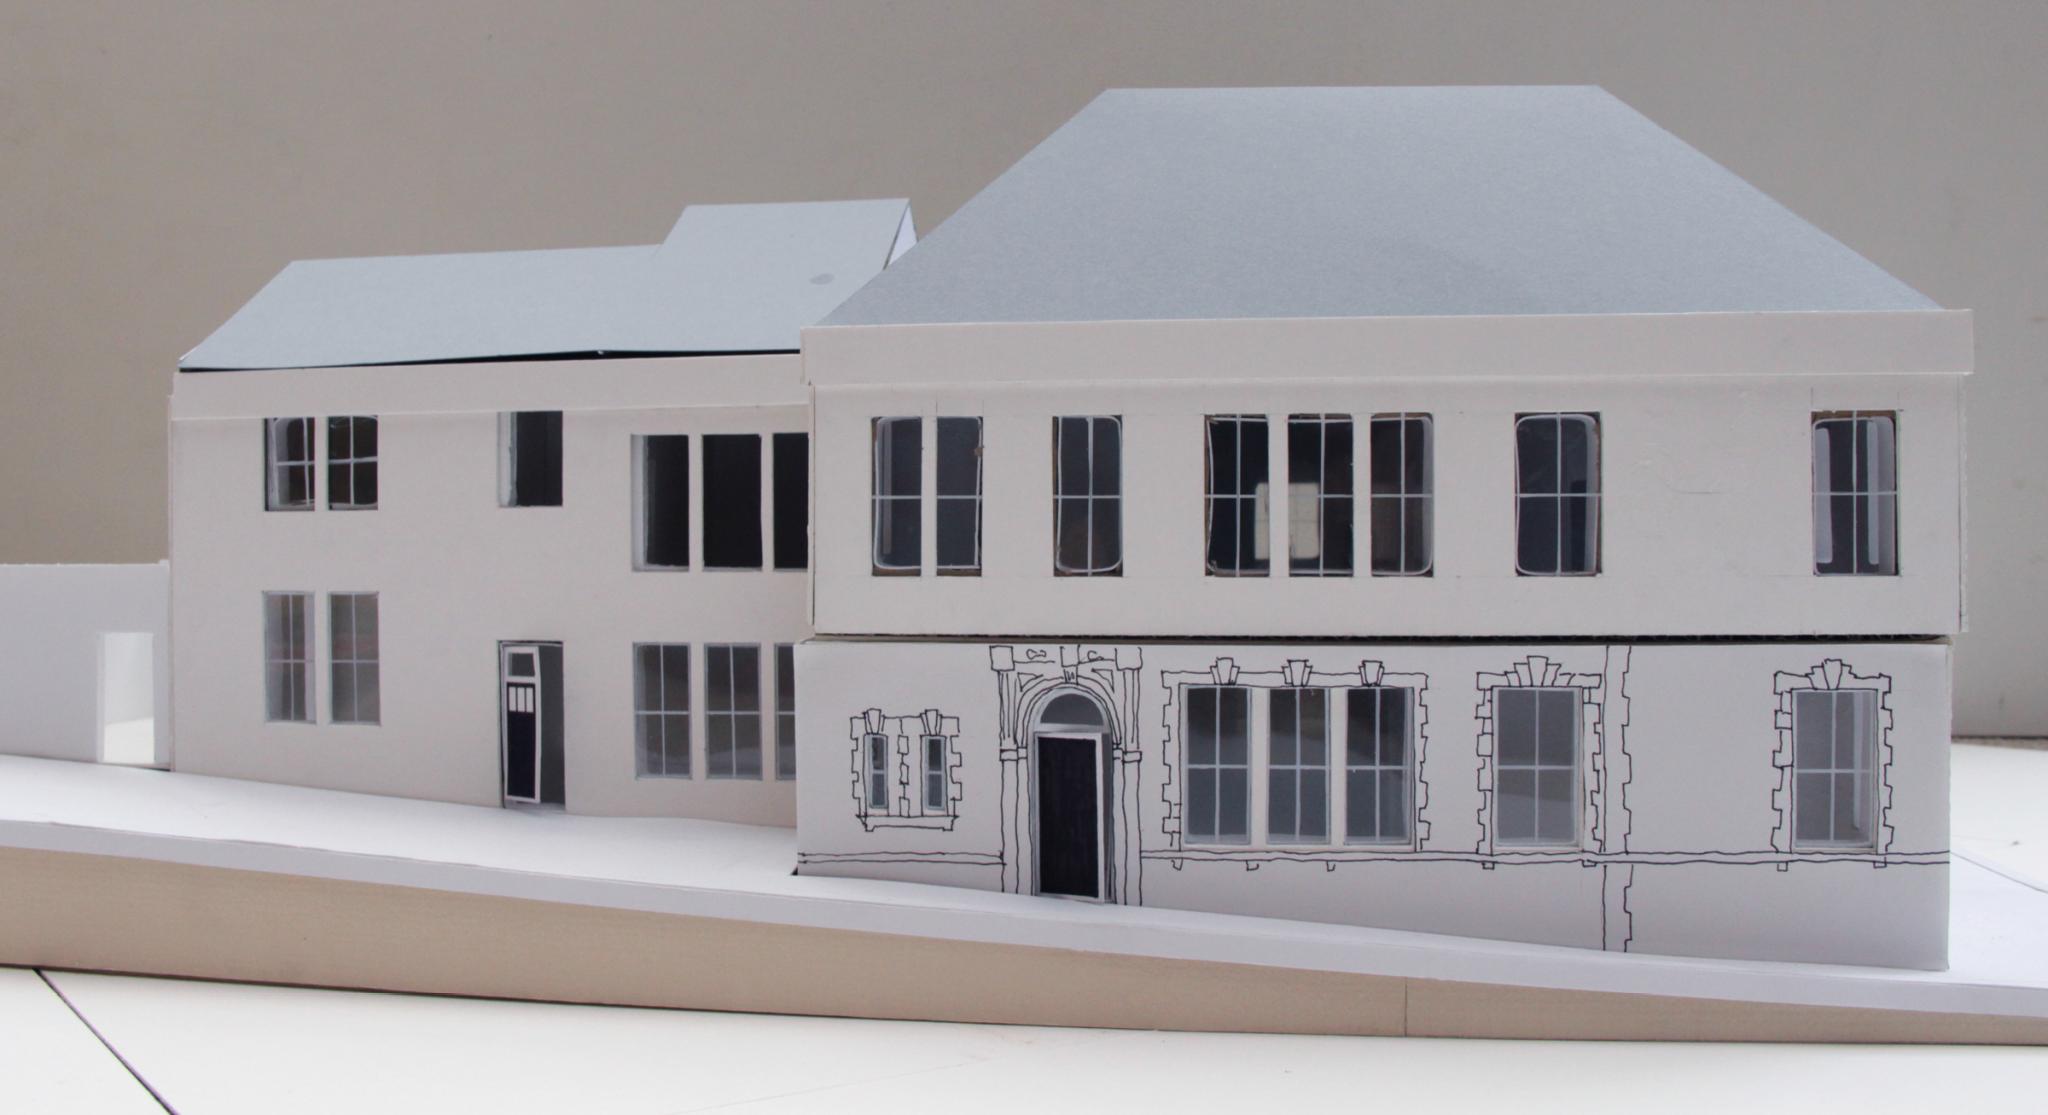 Christchurch St Building model